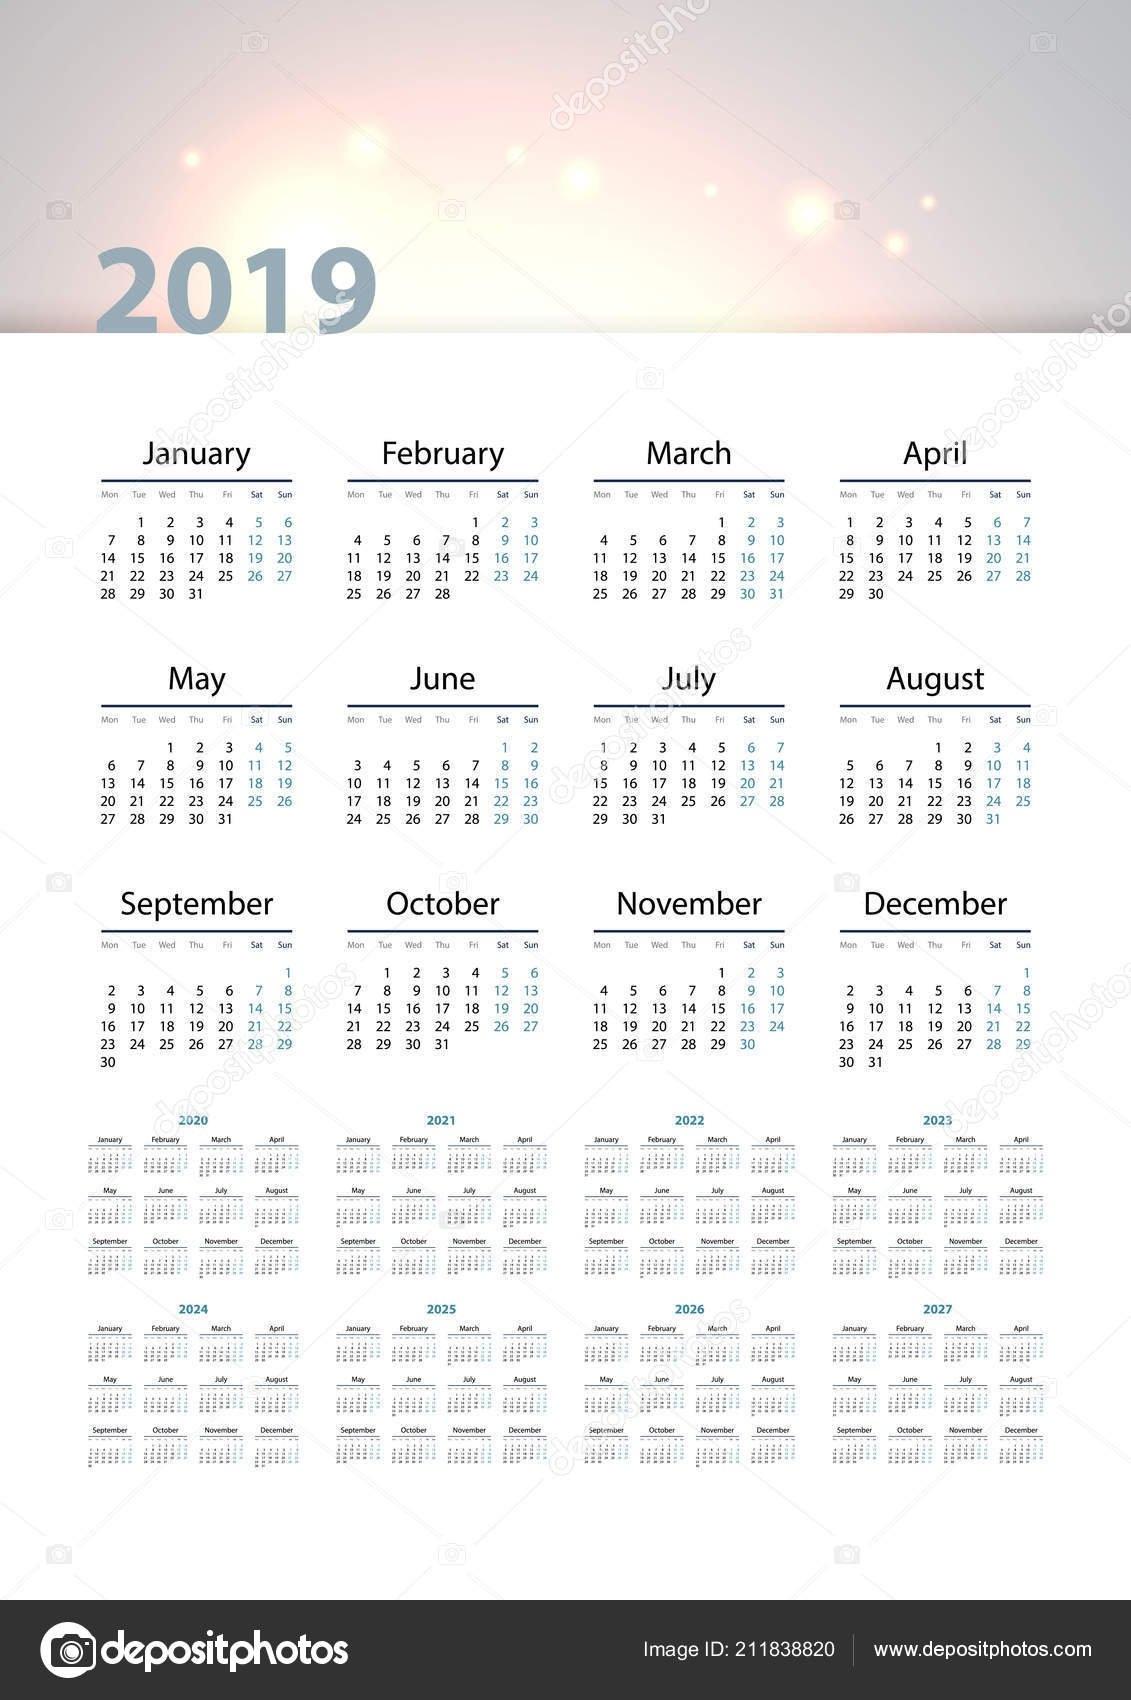 Calendar 2019 2020 2021 2022 2023 2024 2025 2026 2027 — Stock Vector © Tashechka #211838820 with regard to Ucsb 2019 2021 Calendar Photo